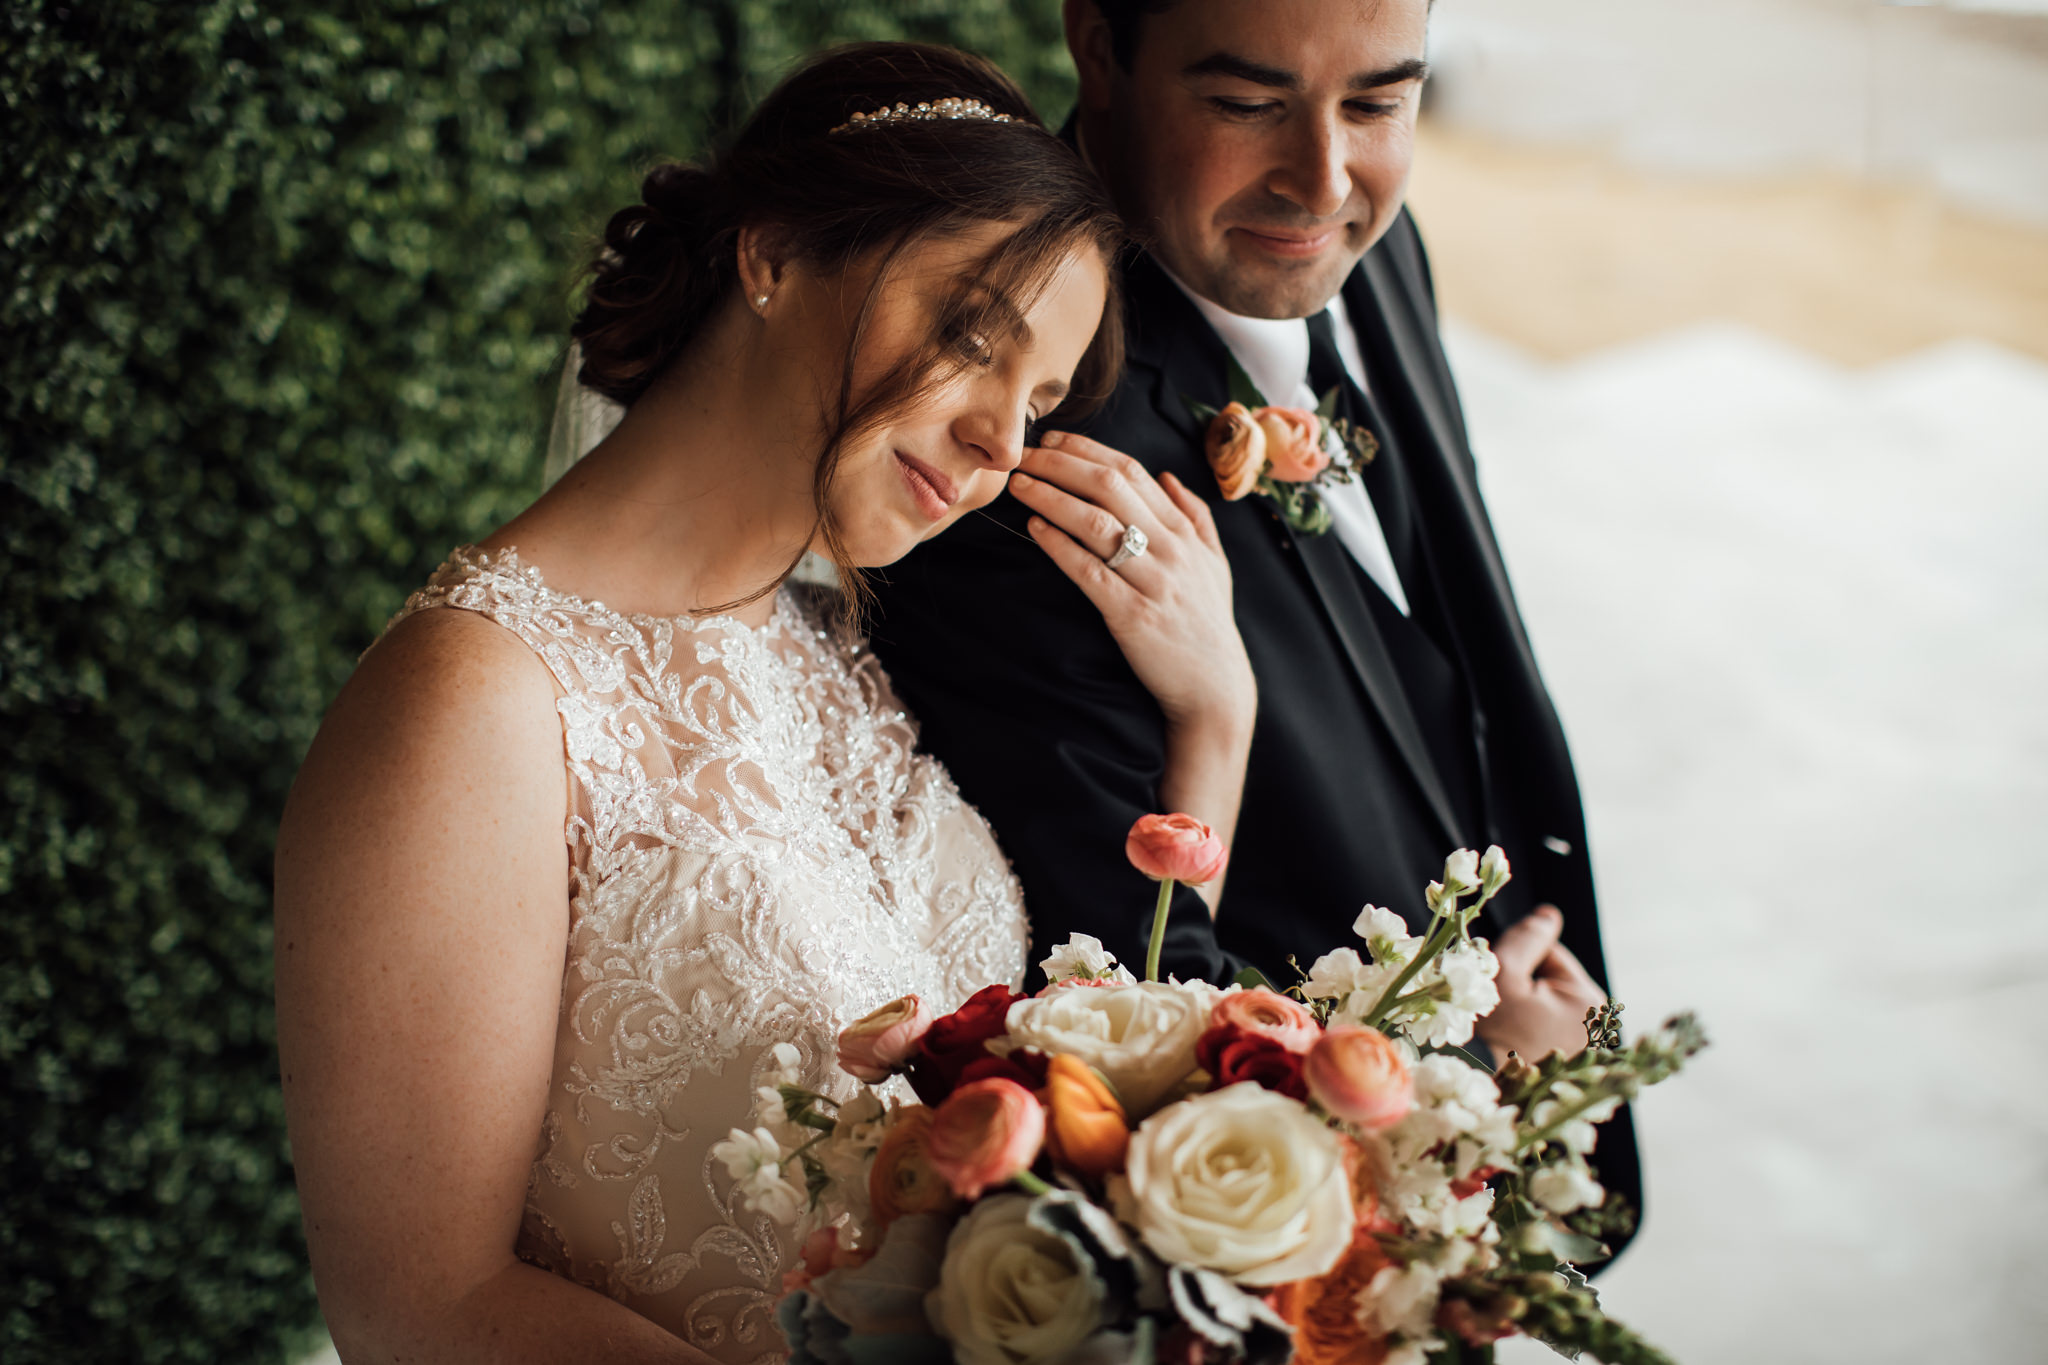 memphis-wedding-photographer-cassie-cook-photography-2.jpg